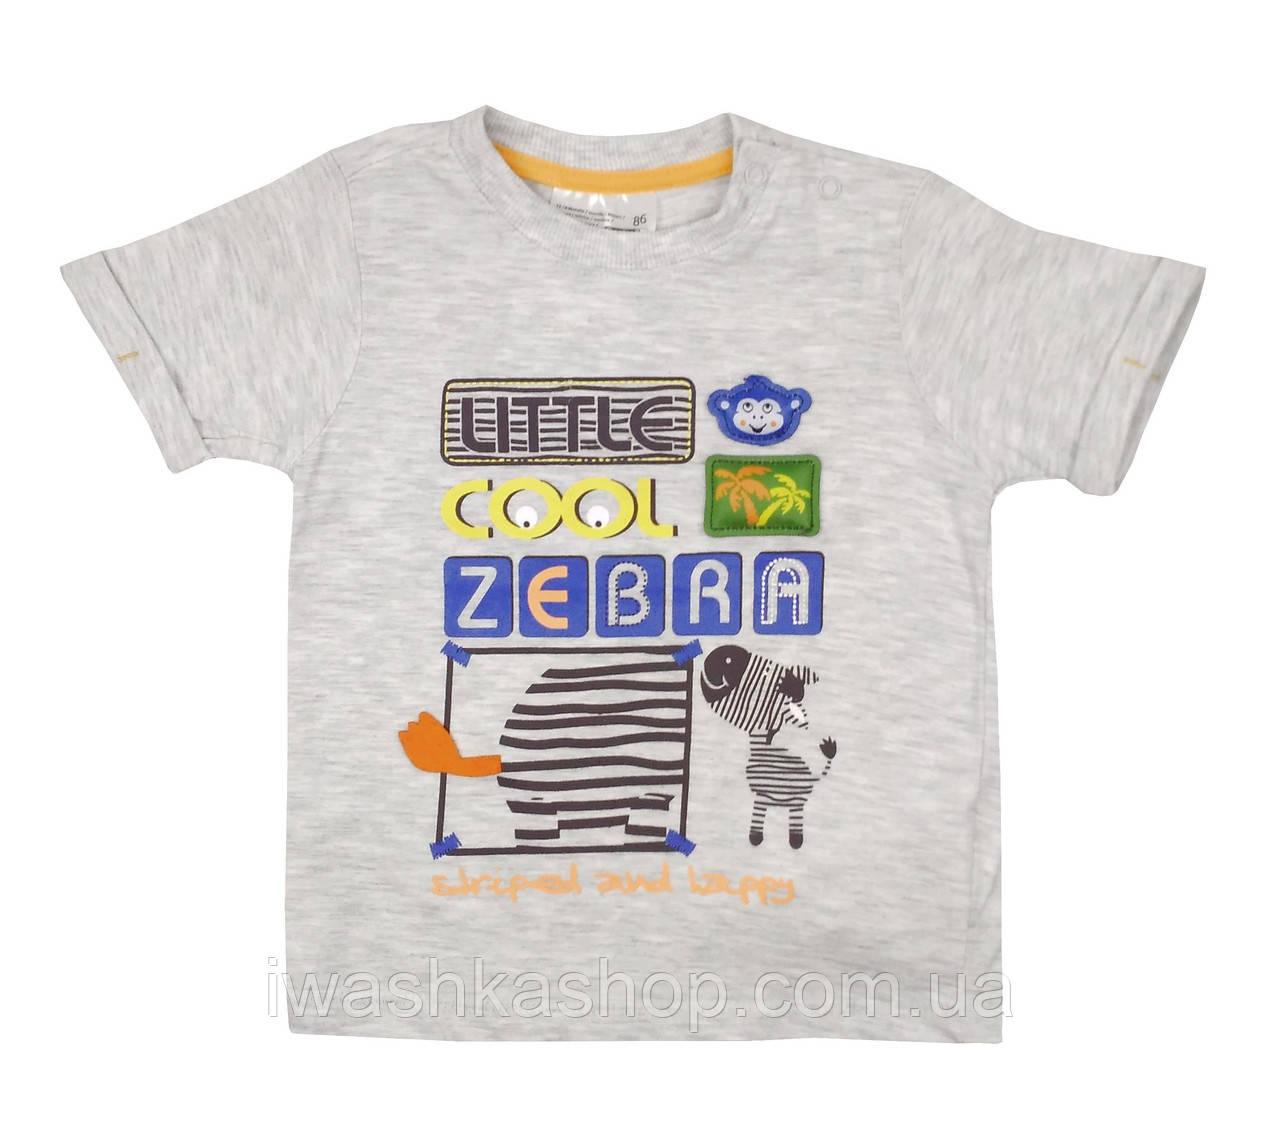 Стильная серая футболка на мальчика 9 - 12 месяцев, р. 80, Ergee / KIK